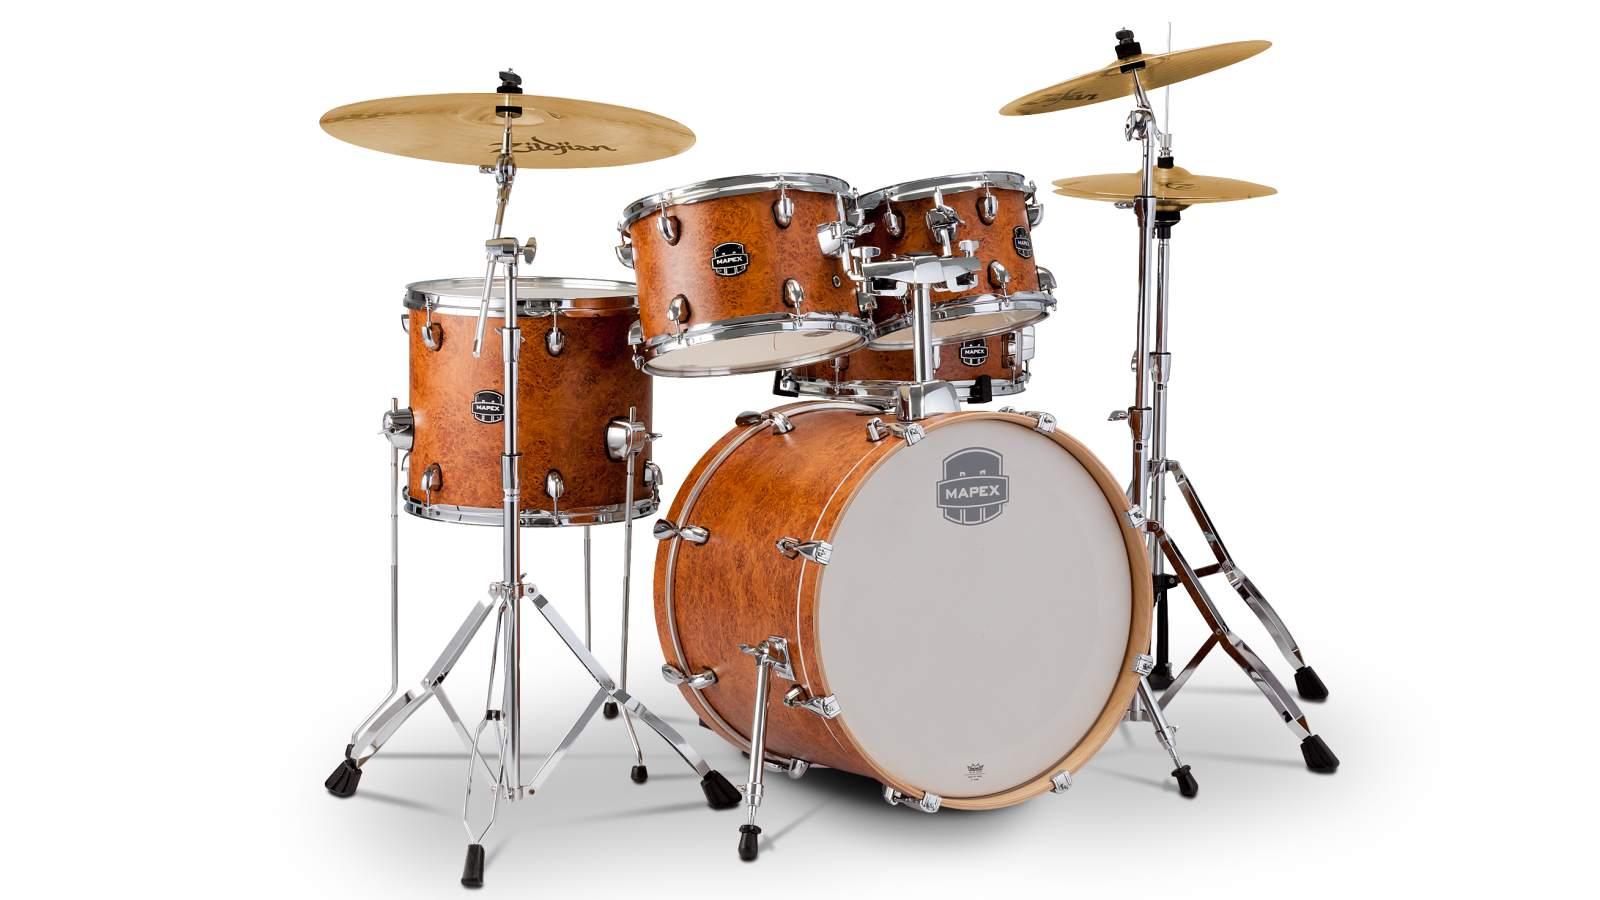 Mapex Storm Drumset 20 - Camphor Wood Grain inkl HW und Becken